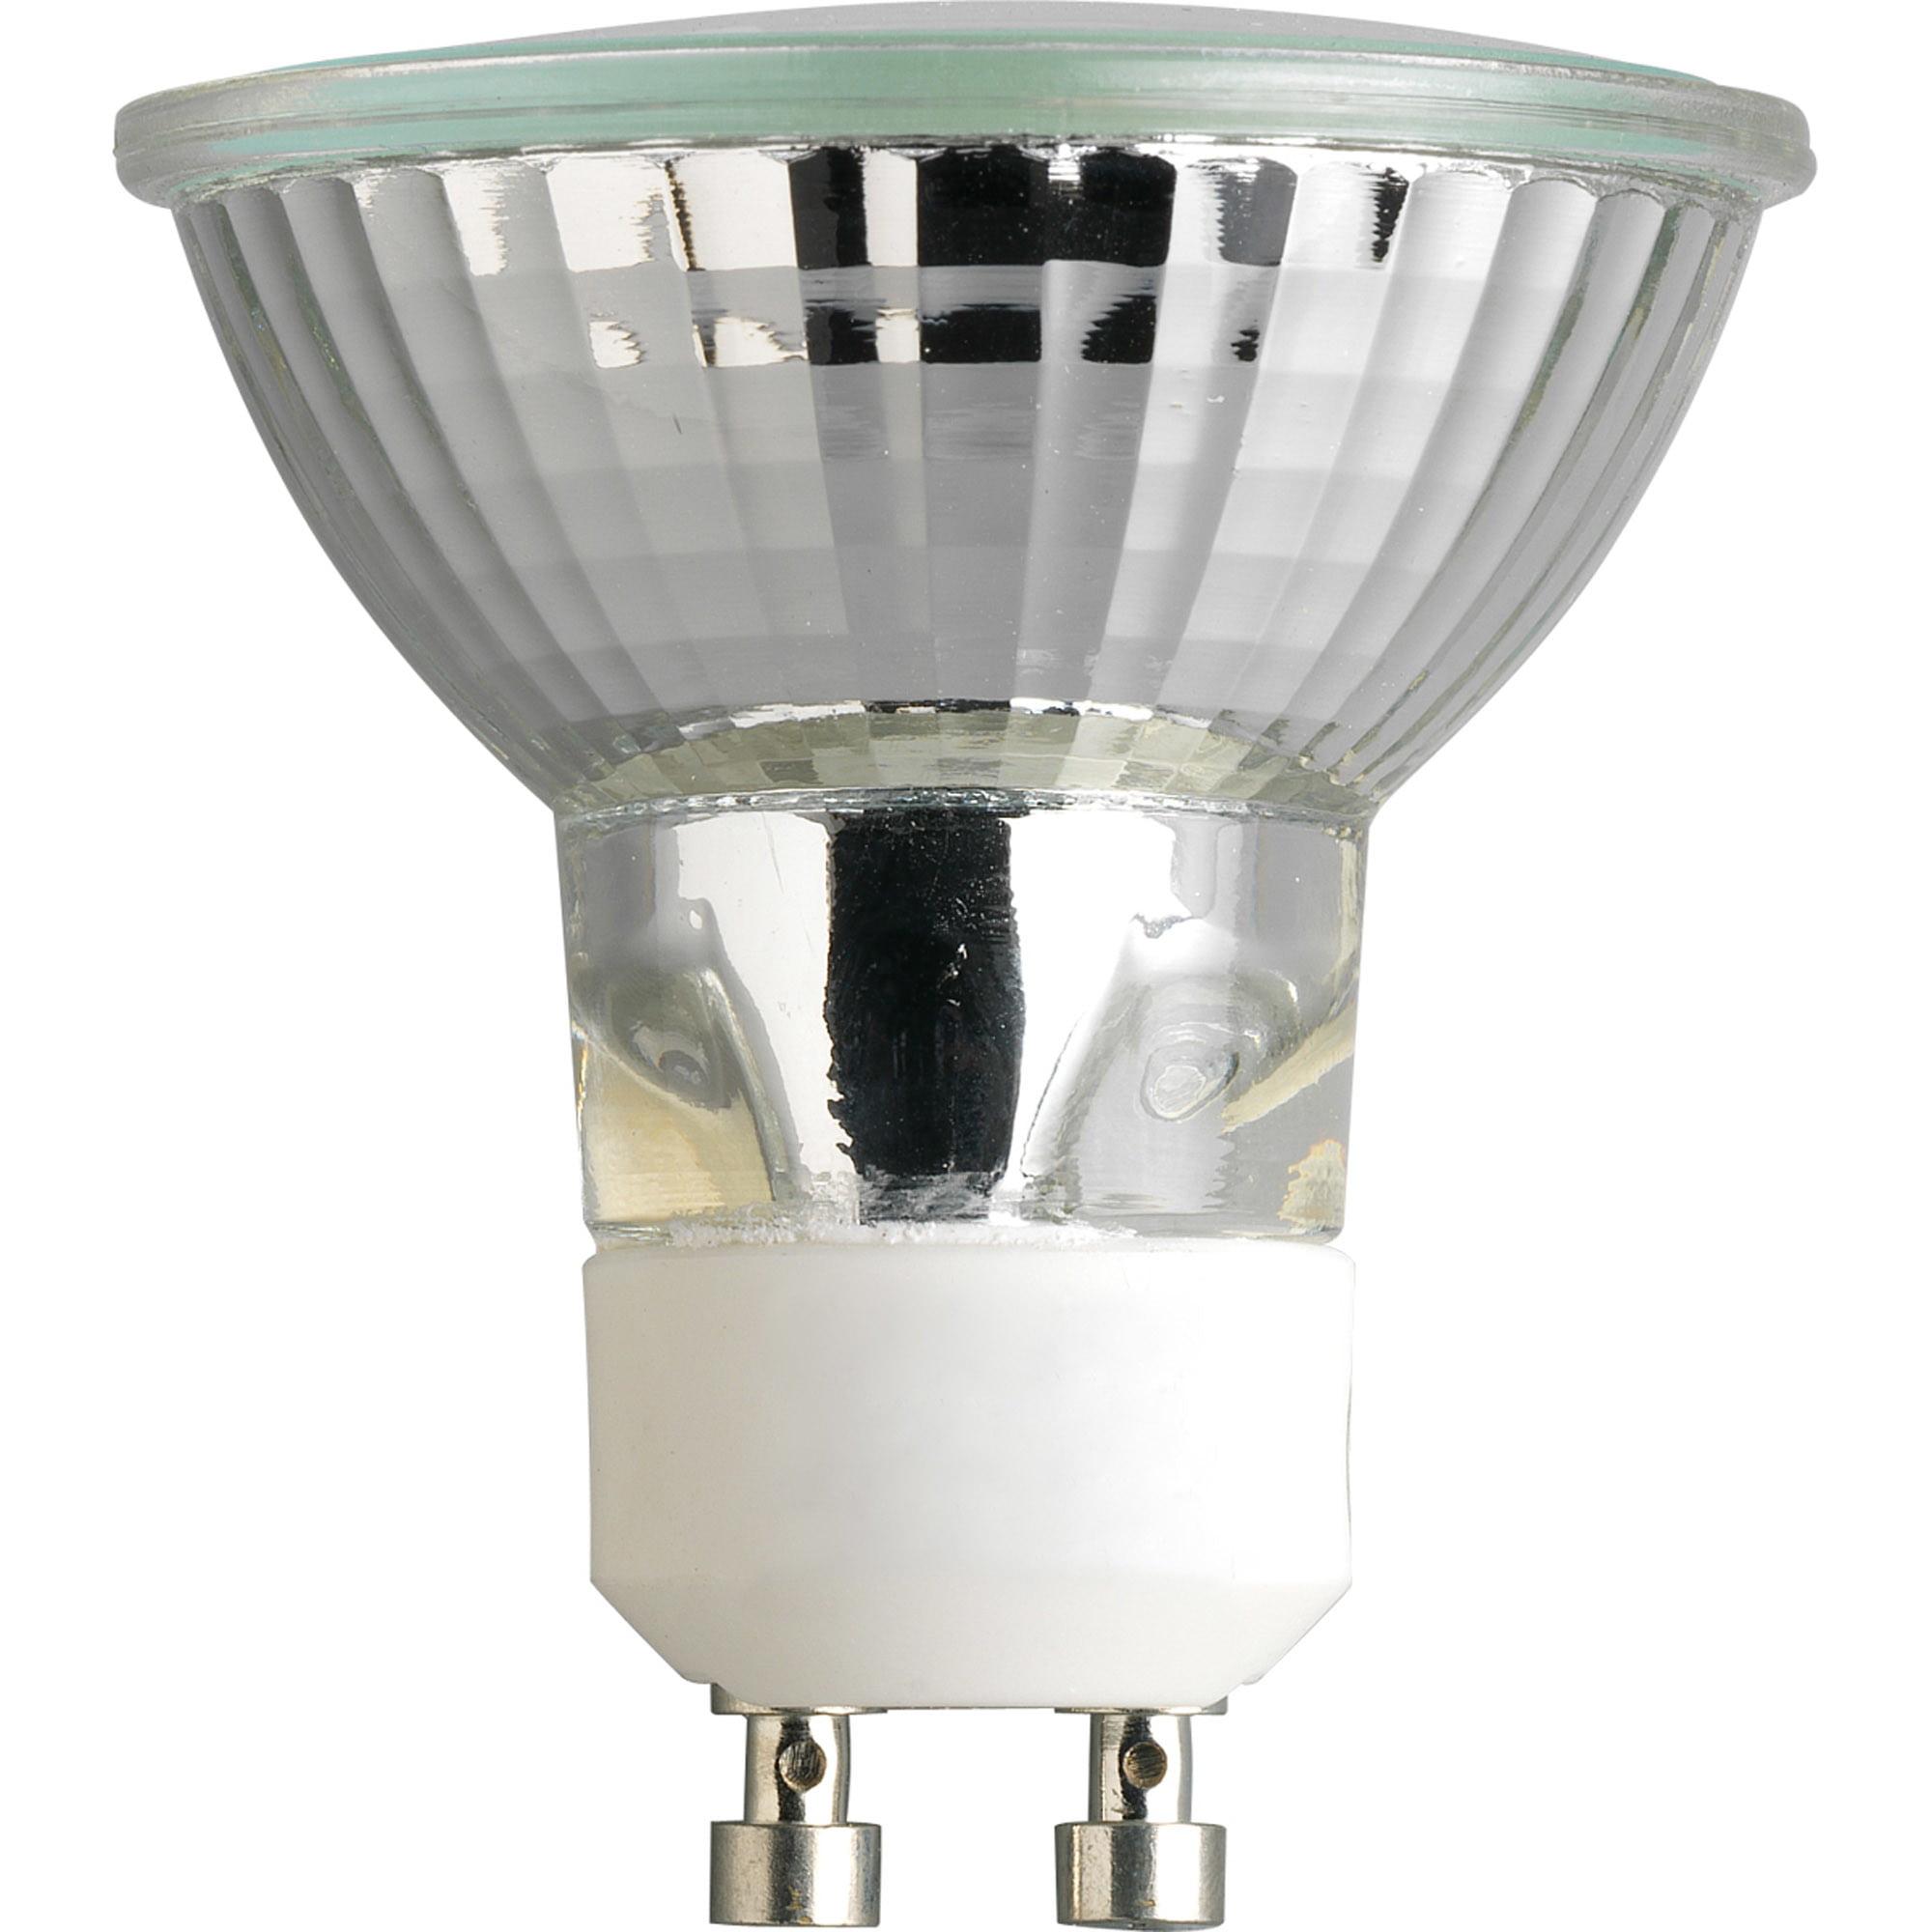 Progress Lighting P7833 Single 50W GU10 Base MR16 Halogen Light Bulb